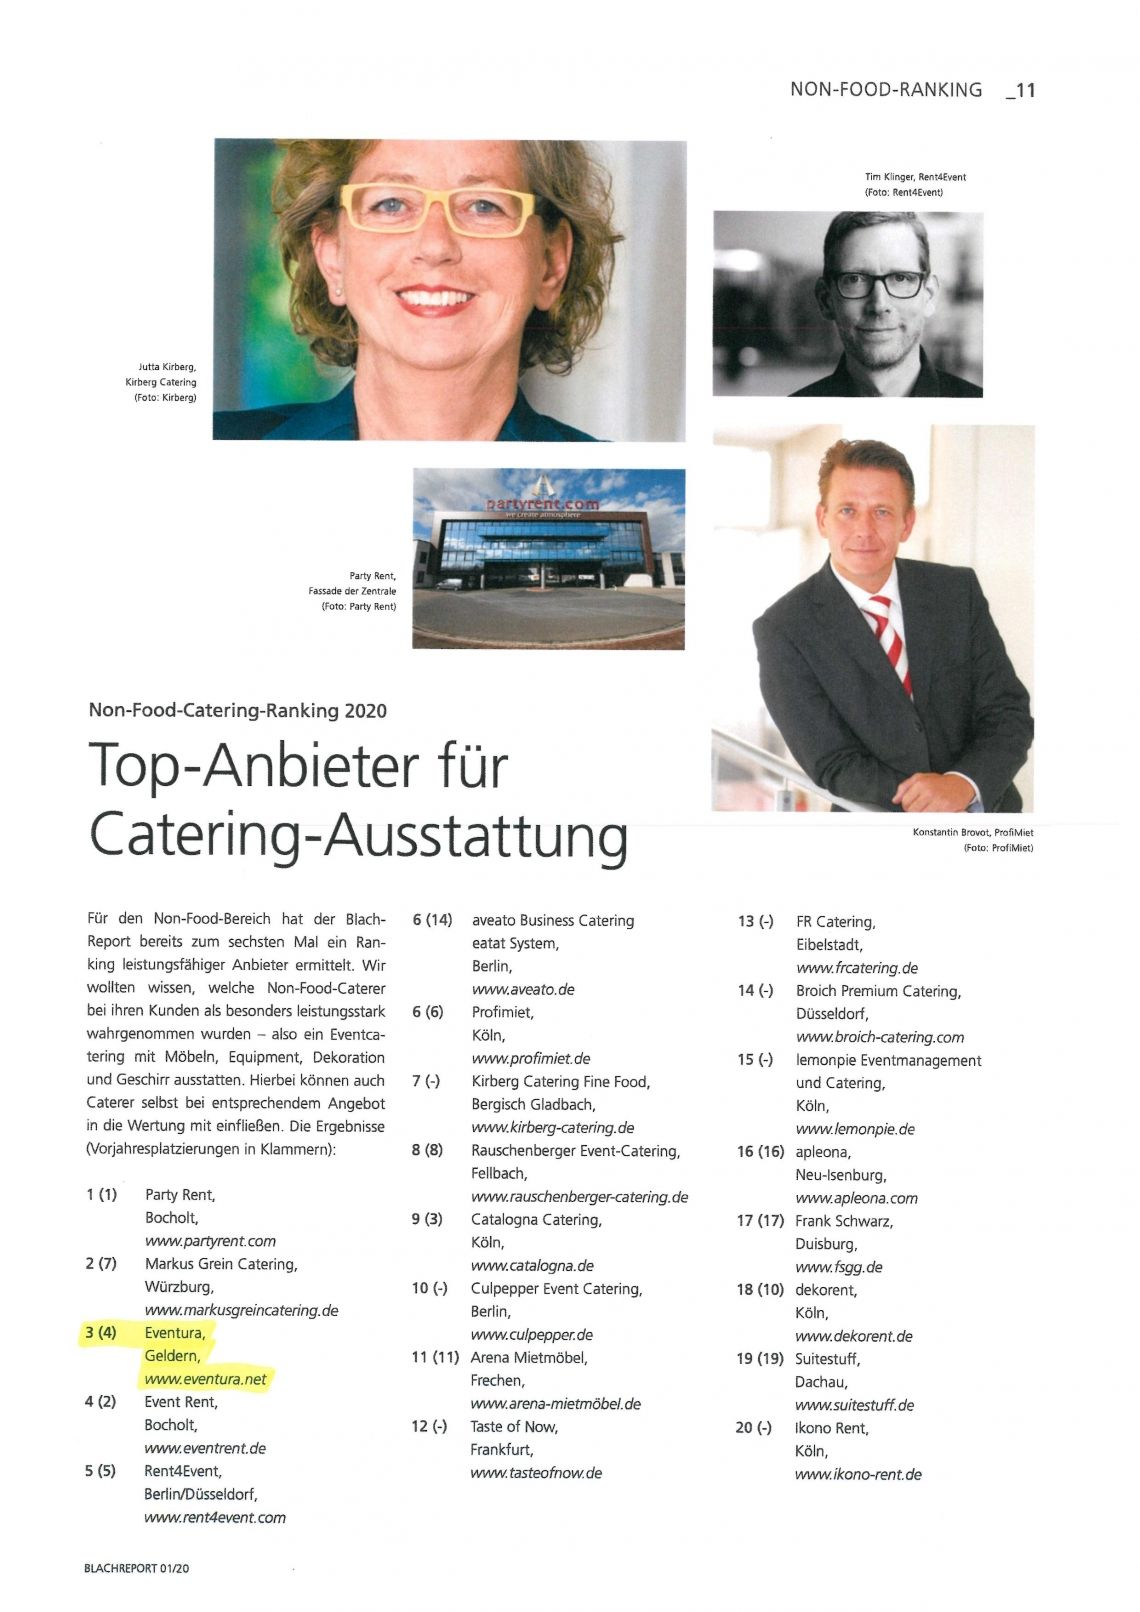 Blach Report: Top-Anbieter für Catering-Ausstattung 2020